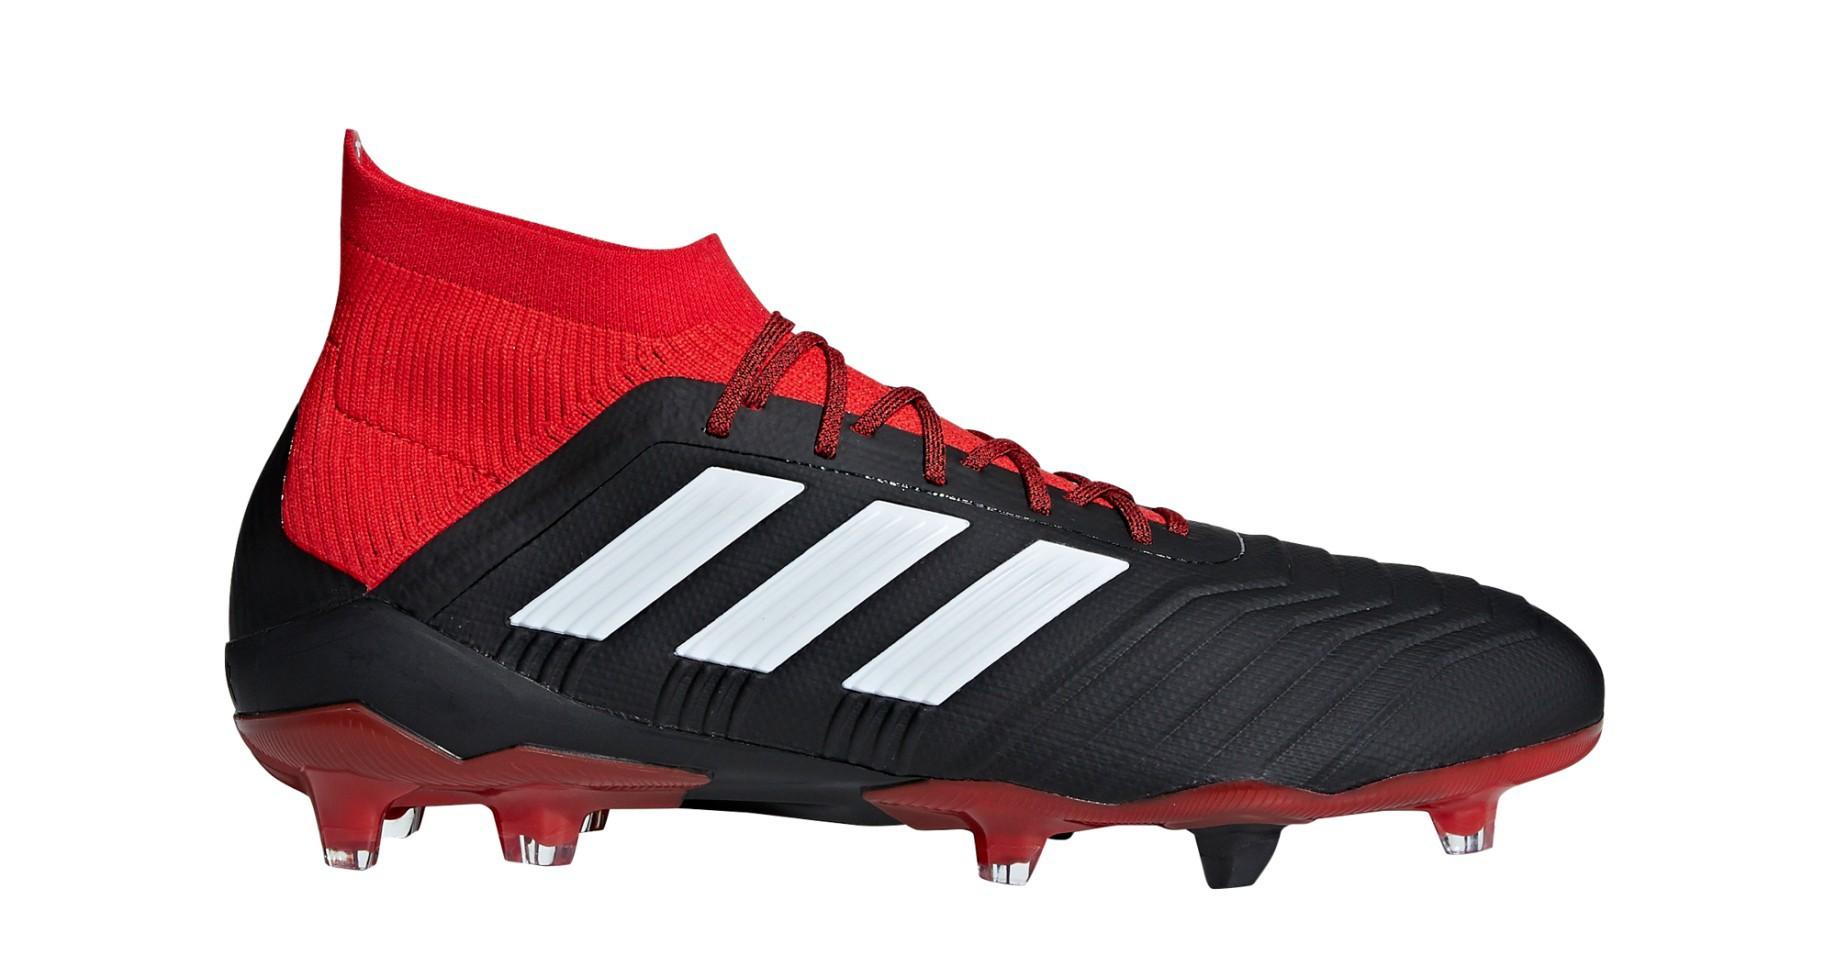 Football boots Adidas Predator 18.1 FG Team Mode Pack